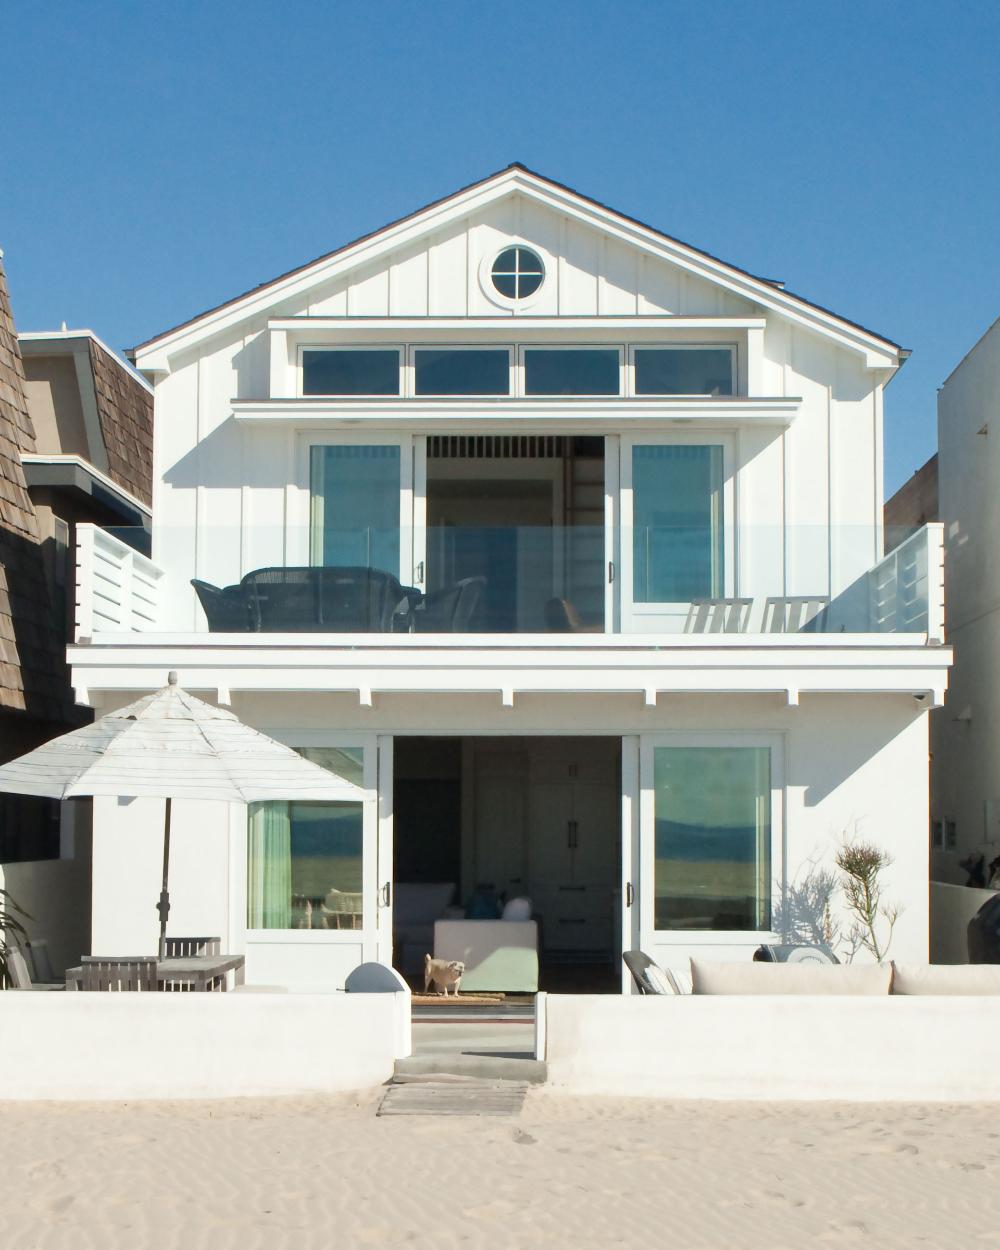 Life S A Beach In 2020 Modern Beach House Decor Beach House Decor Beach Cottage Design